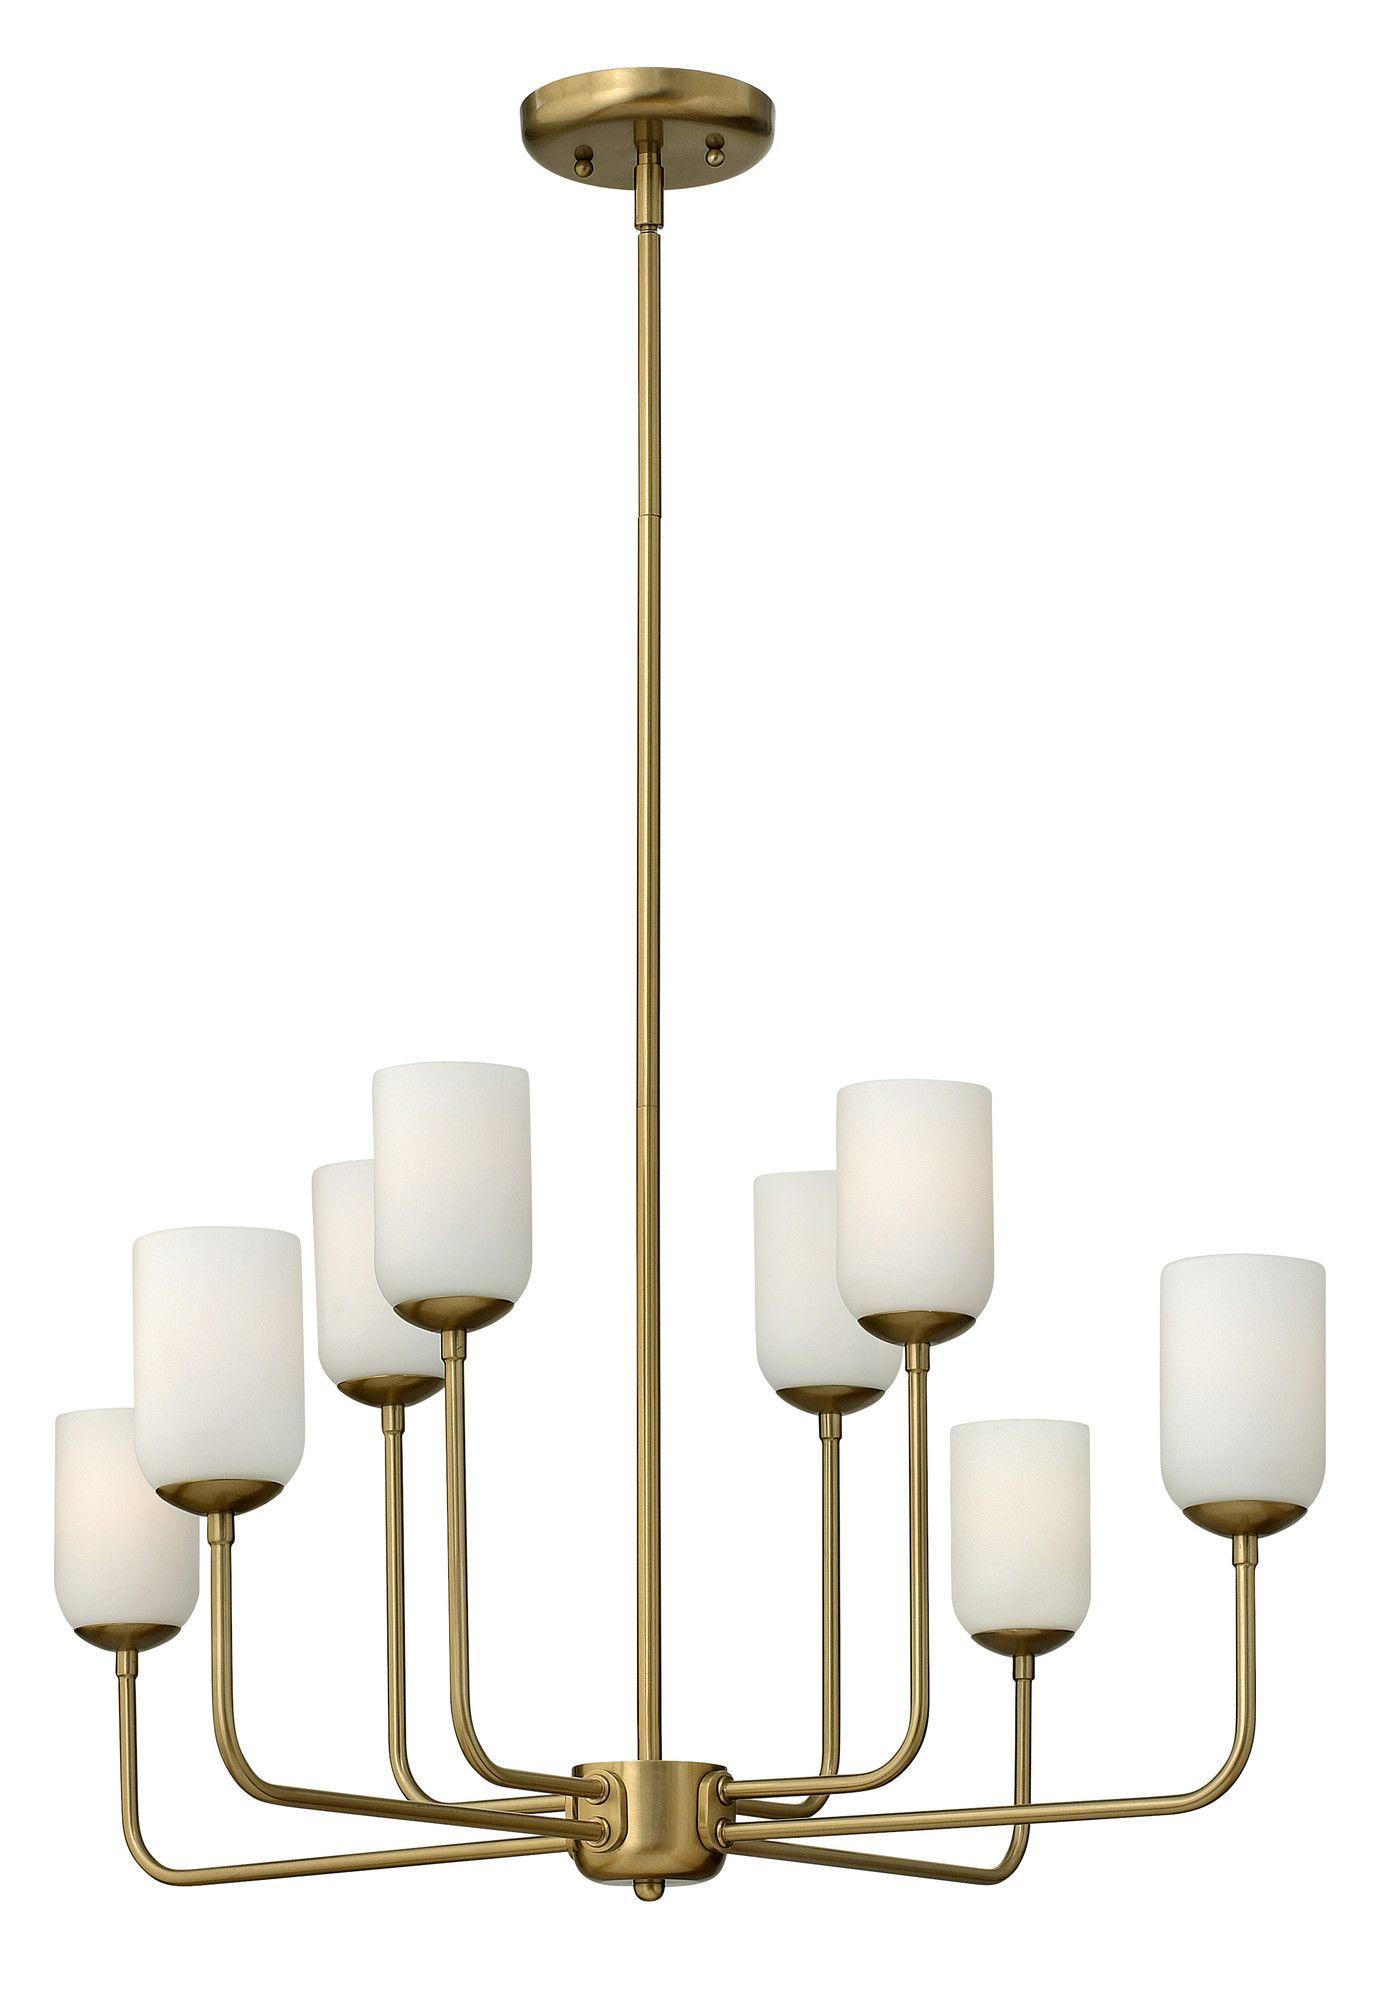 Hinkley lighting harlow 8 light chandelier wayfair lighting hinkley lighting harlow 8 light chandelier wayfair aloadofball Image collections